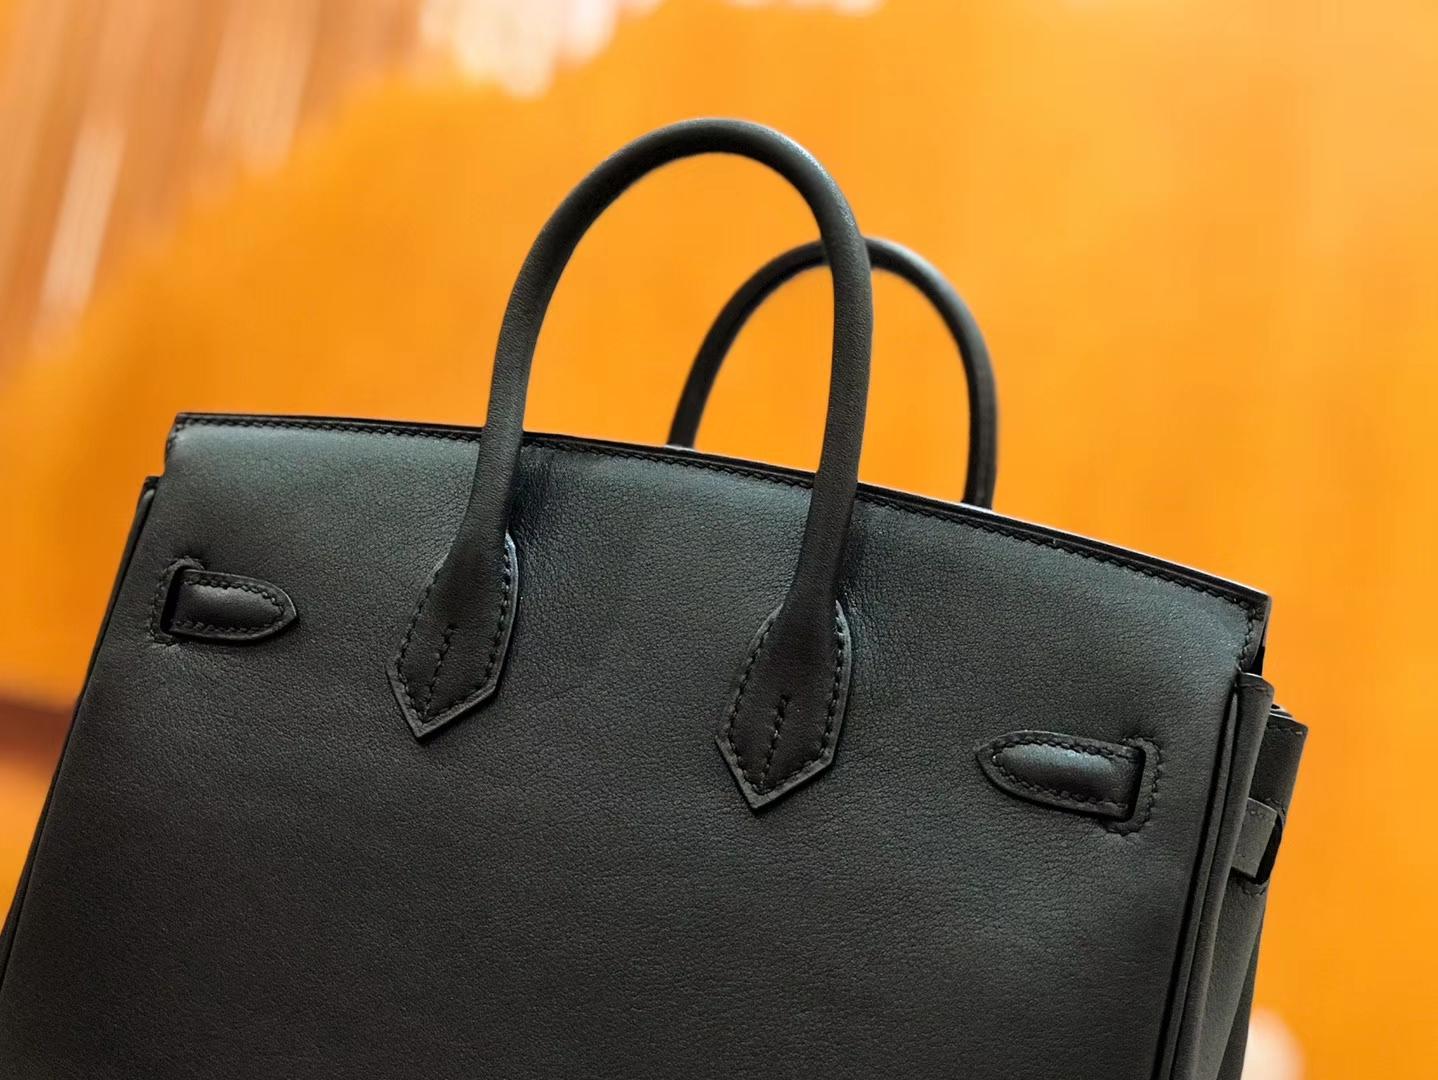 Hermès(爱马仕)Birkin 25cm swift 牛皮 经典黑 金扣 全手工缝制